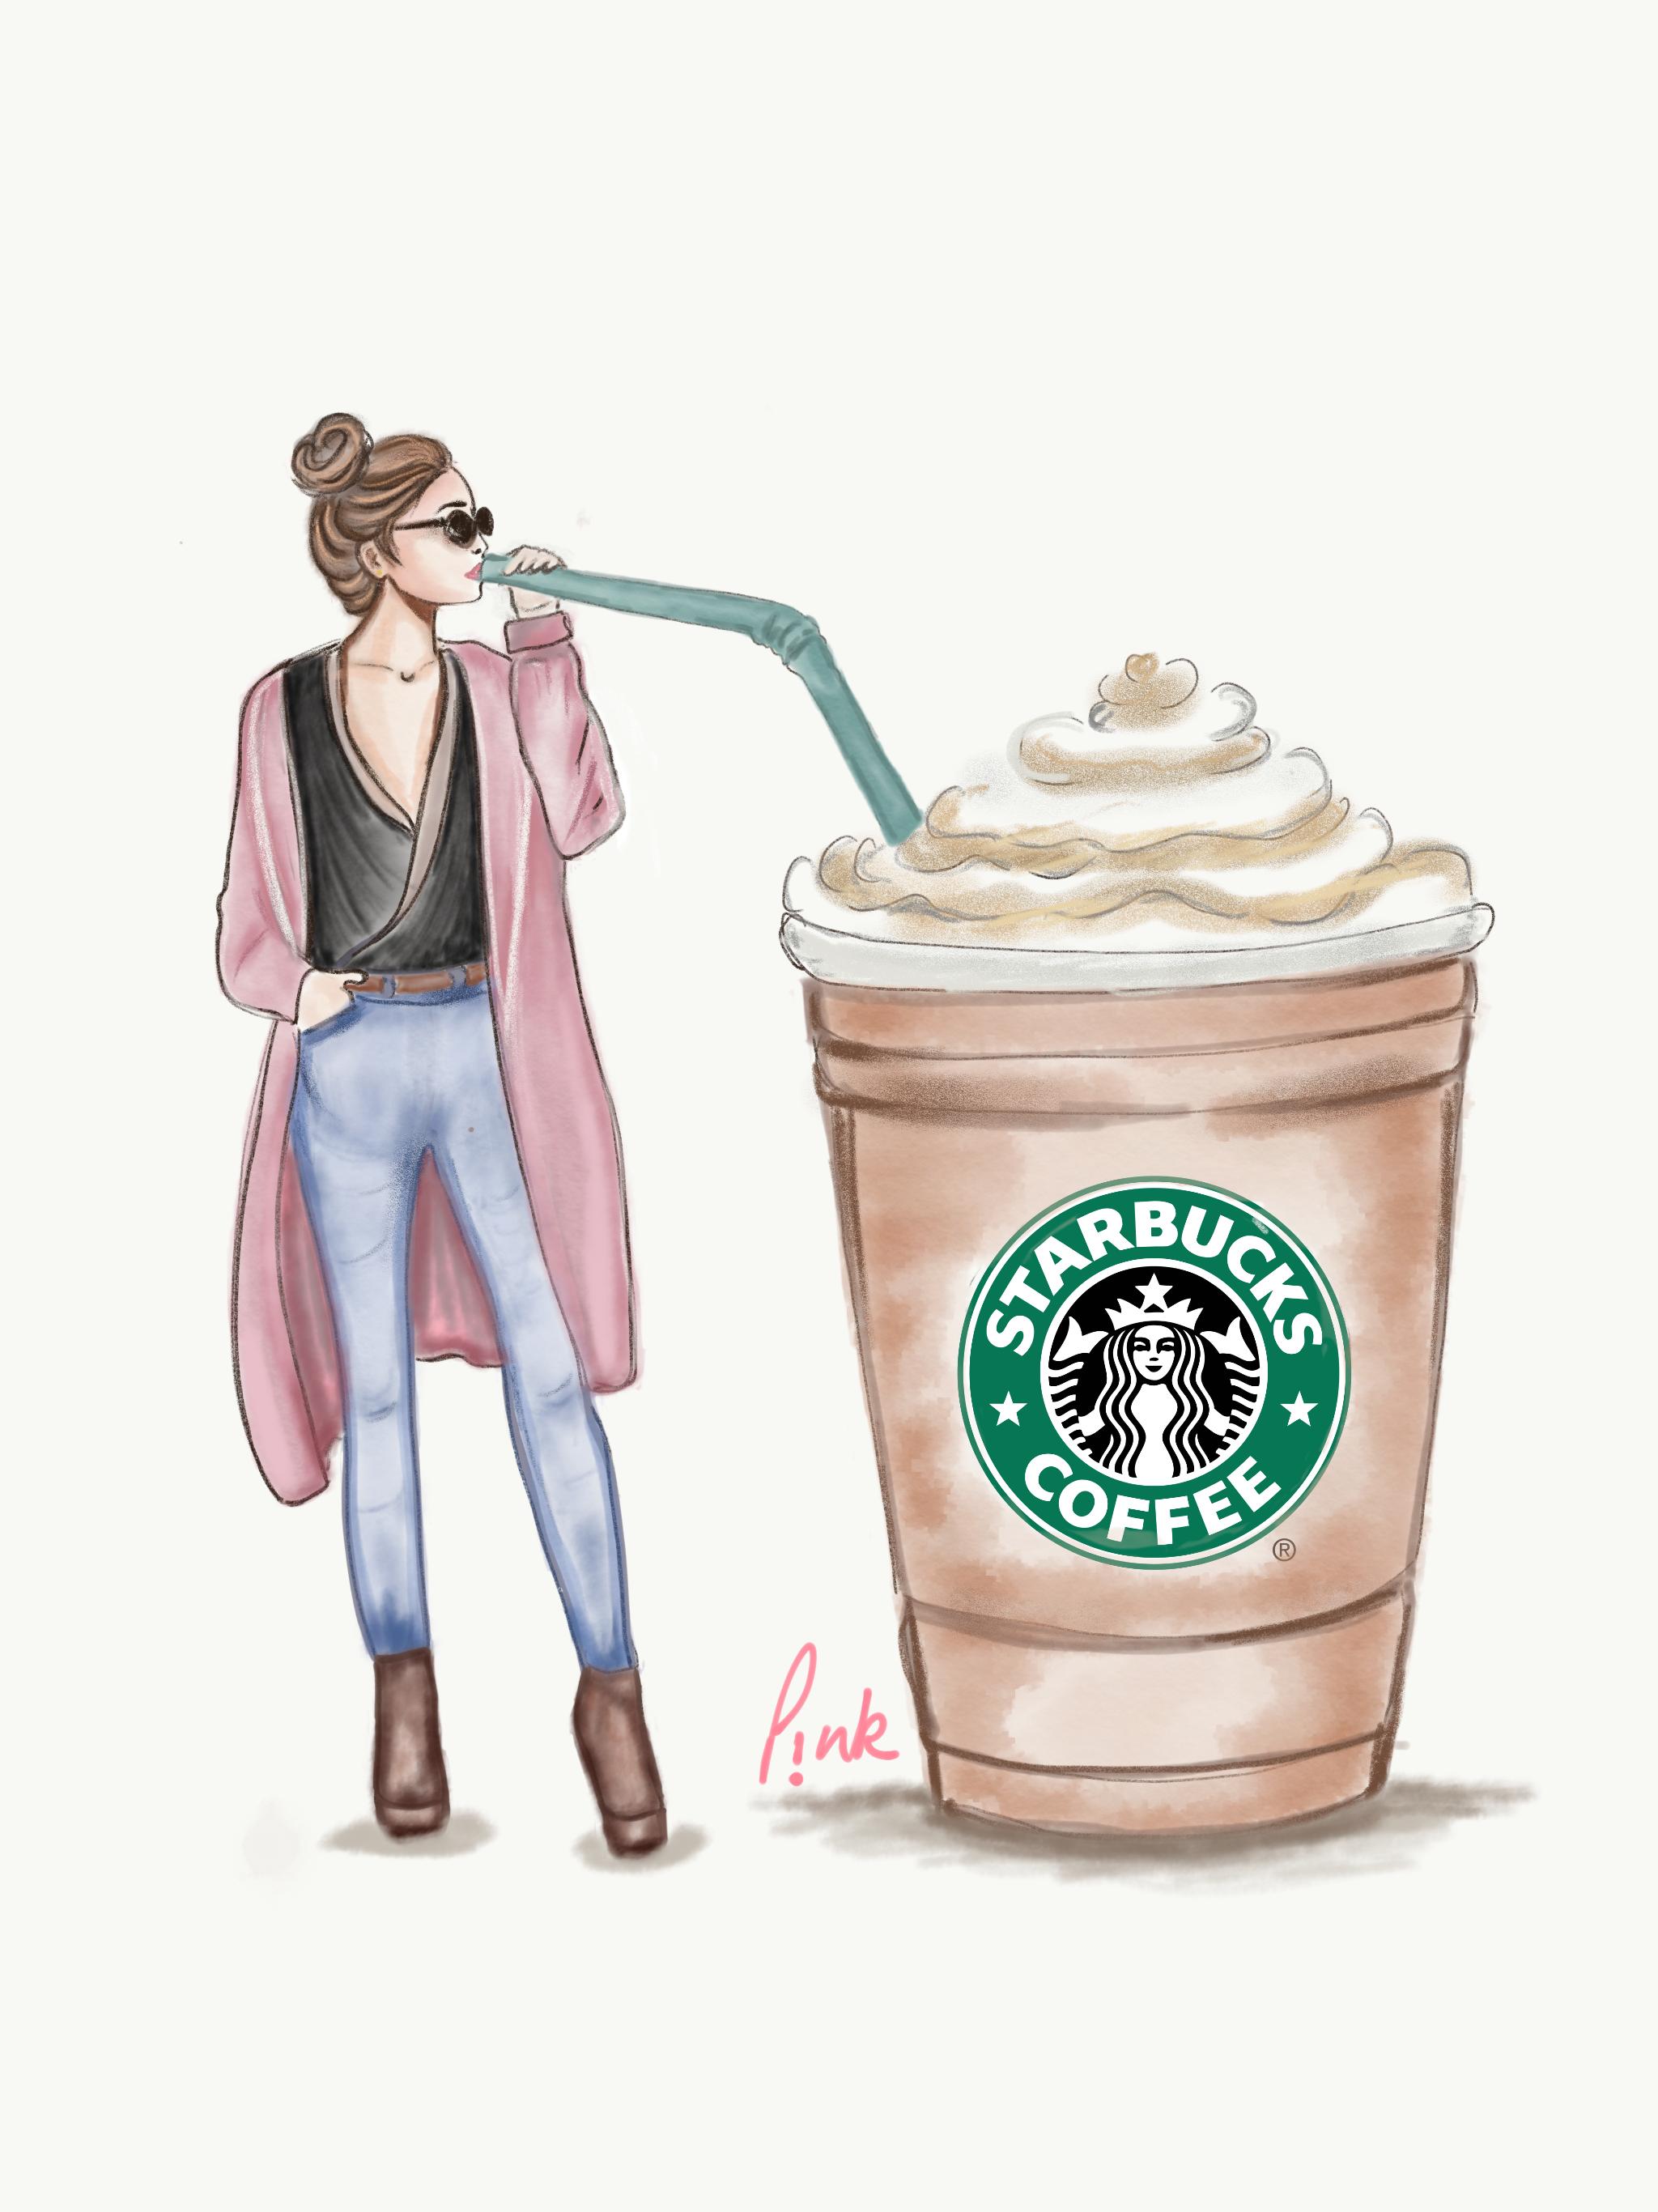 Share Of Mốc Starbucks Wallpaper Iphone Wallpaper Emoji Wallpaper